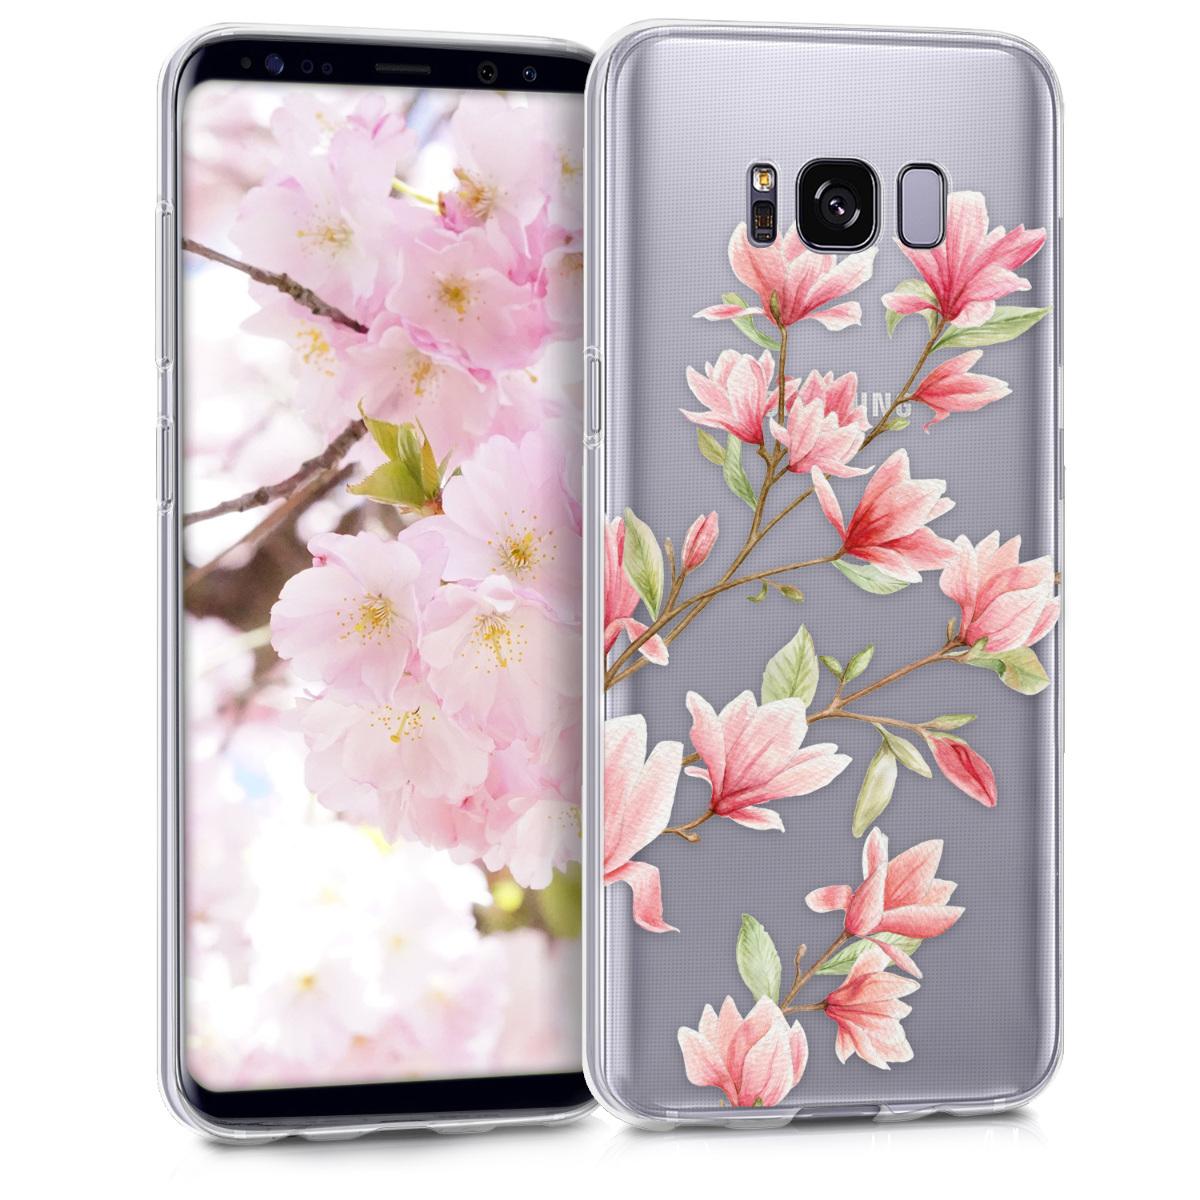 KW Θήκη Σιλικόνης (TPU) Samsung Galaxy S8 - Διάφανη με σχέδιο λουλουδιών (40977.18)